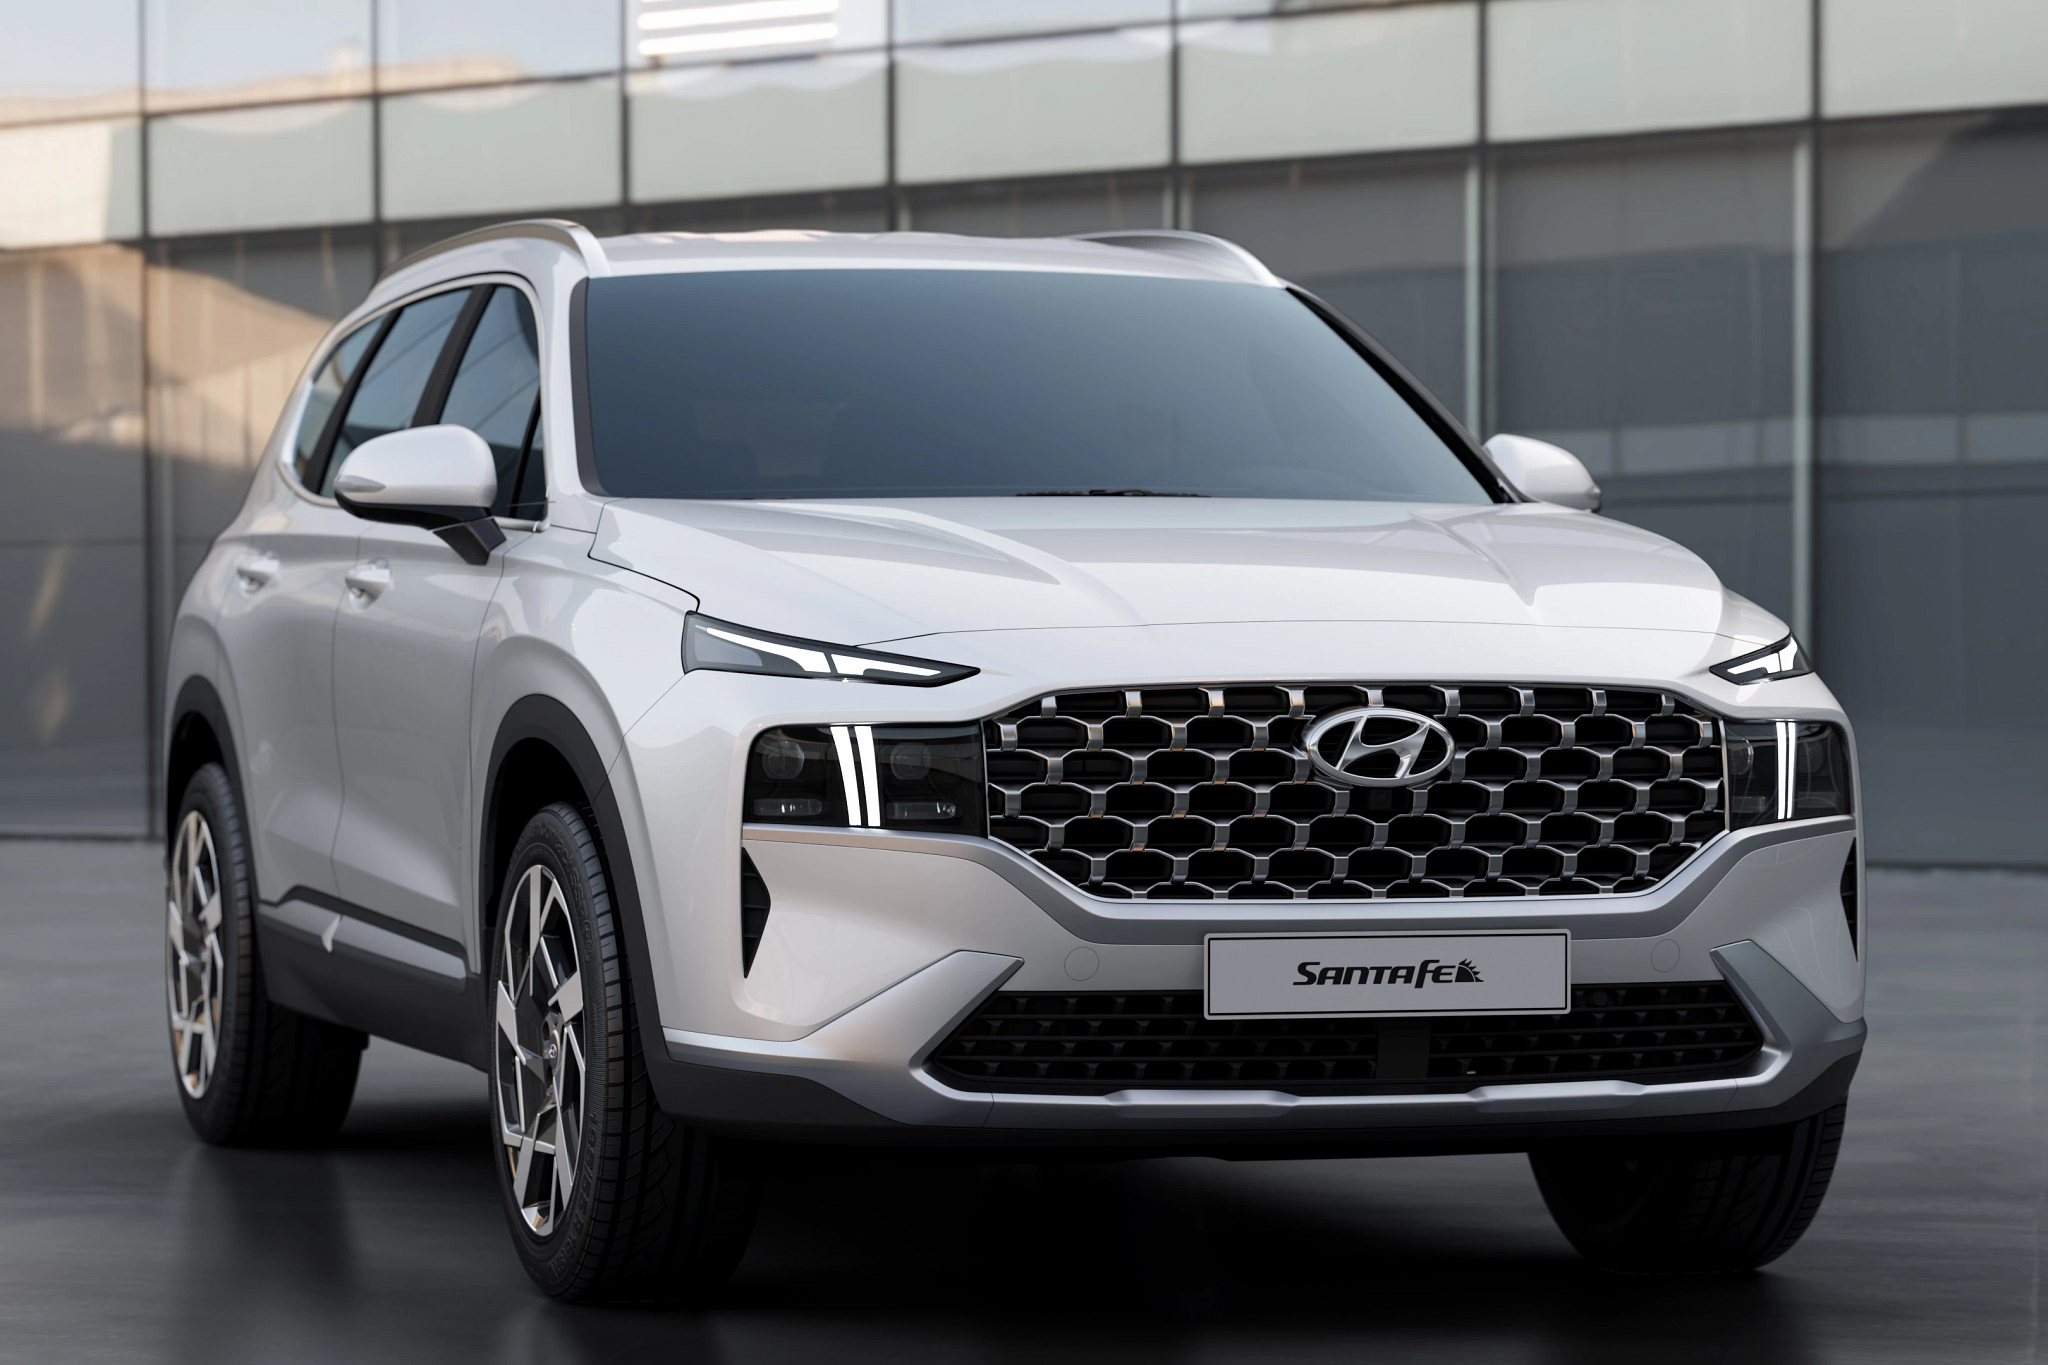 2021 Hyundai Santa Fe Adds Class, Sass to Family SUV